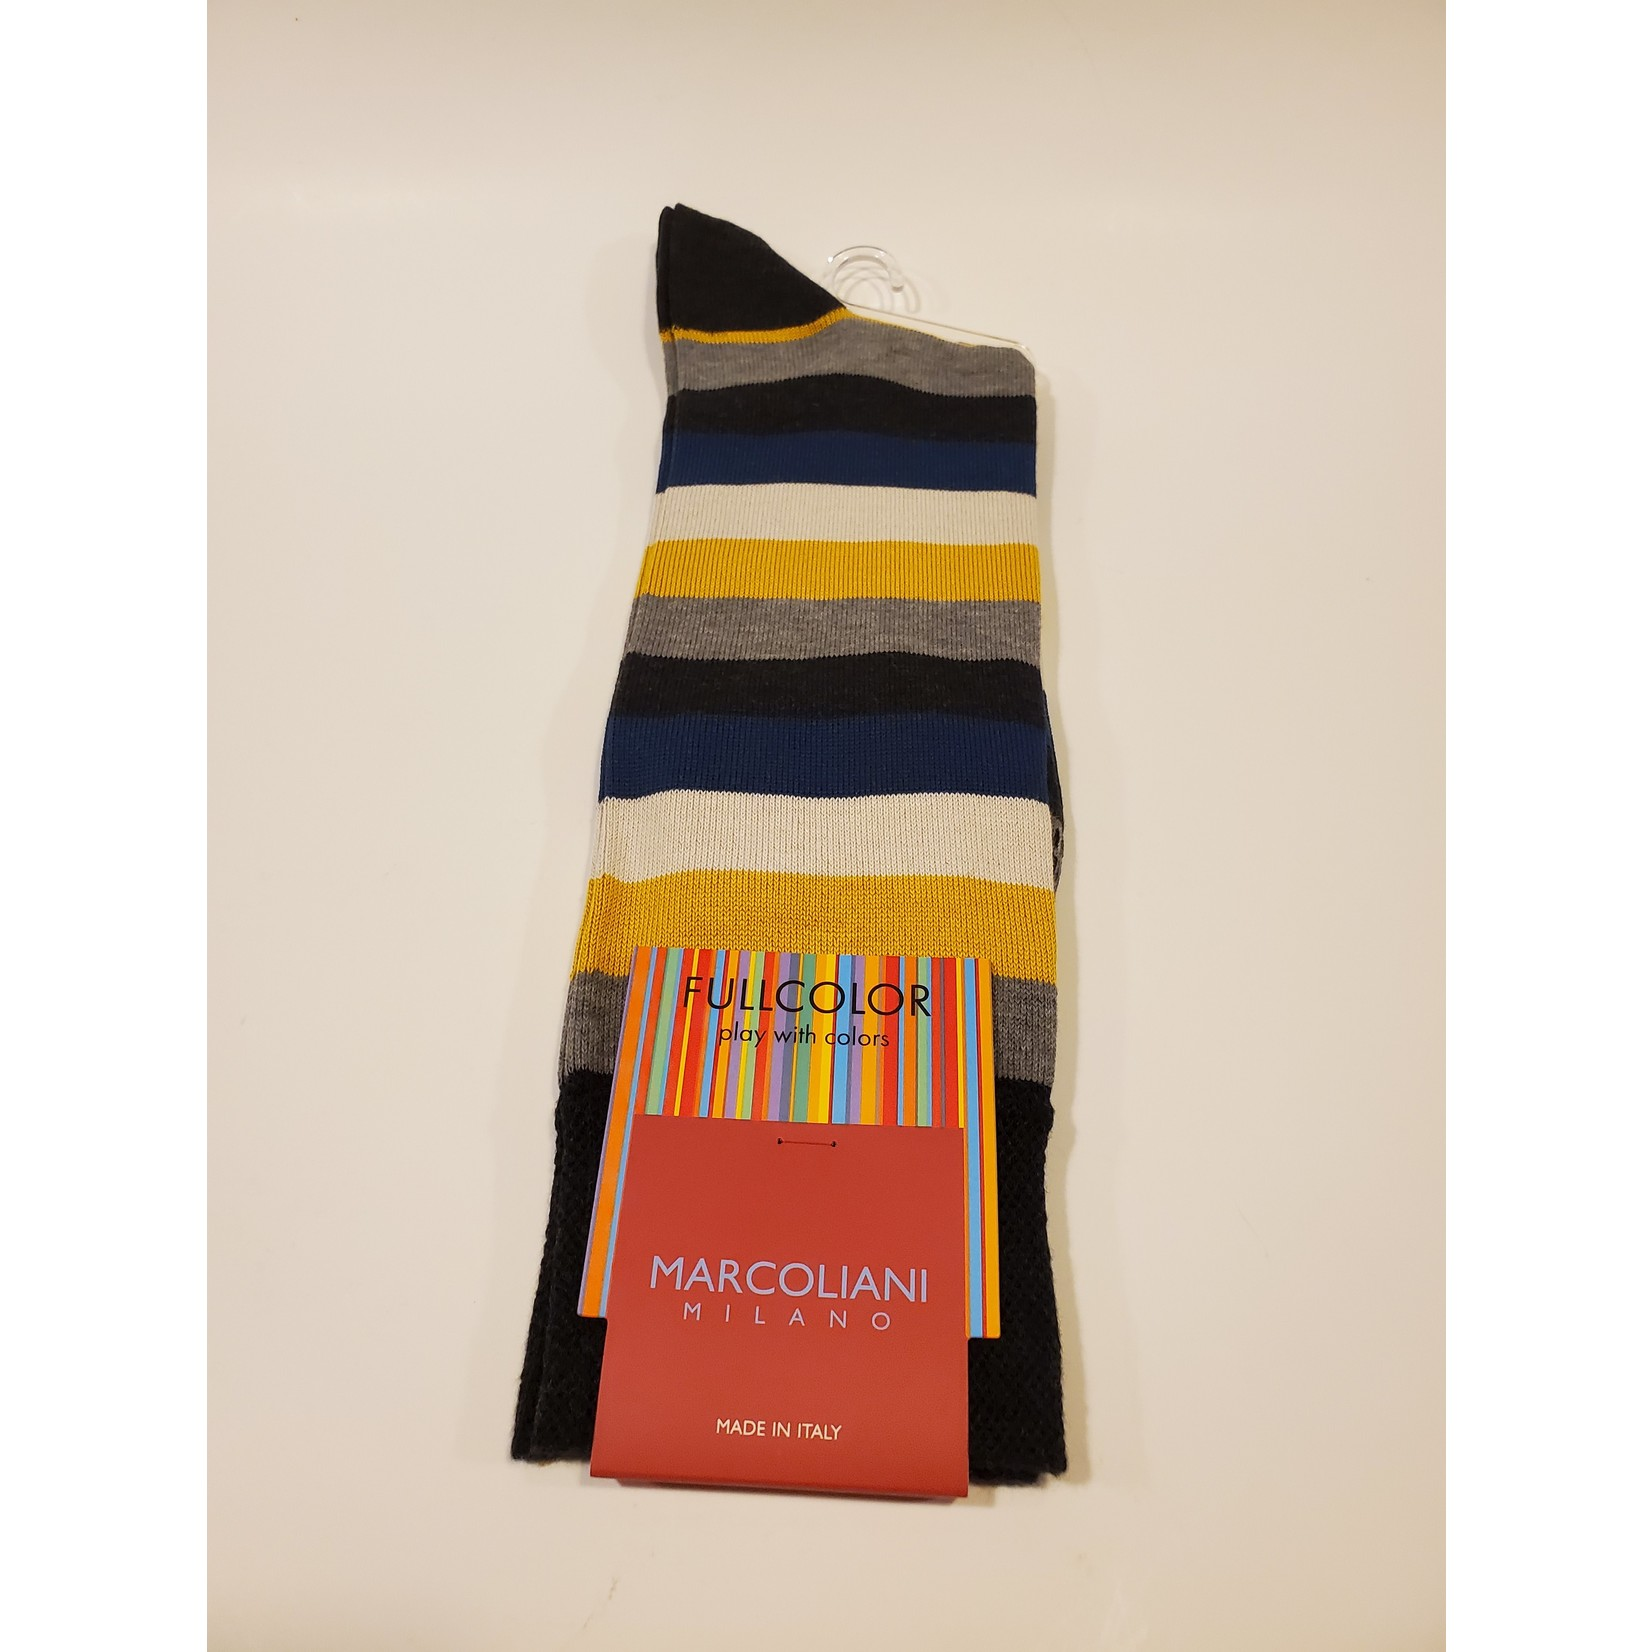 Marcoliani Marcoliani Full Color MAR4524T Collage Stripe - Z23 Charcoal Curry